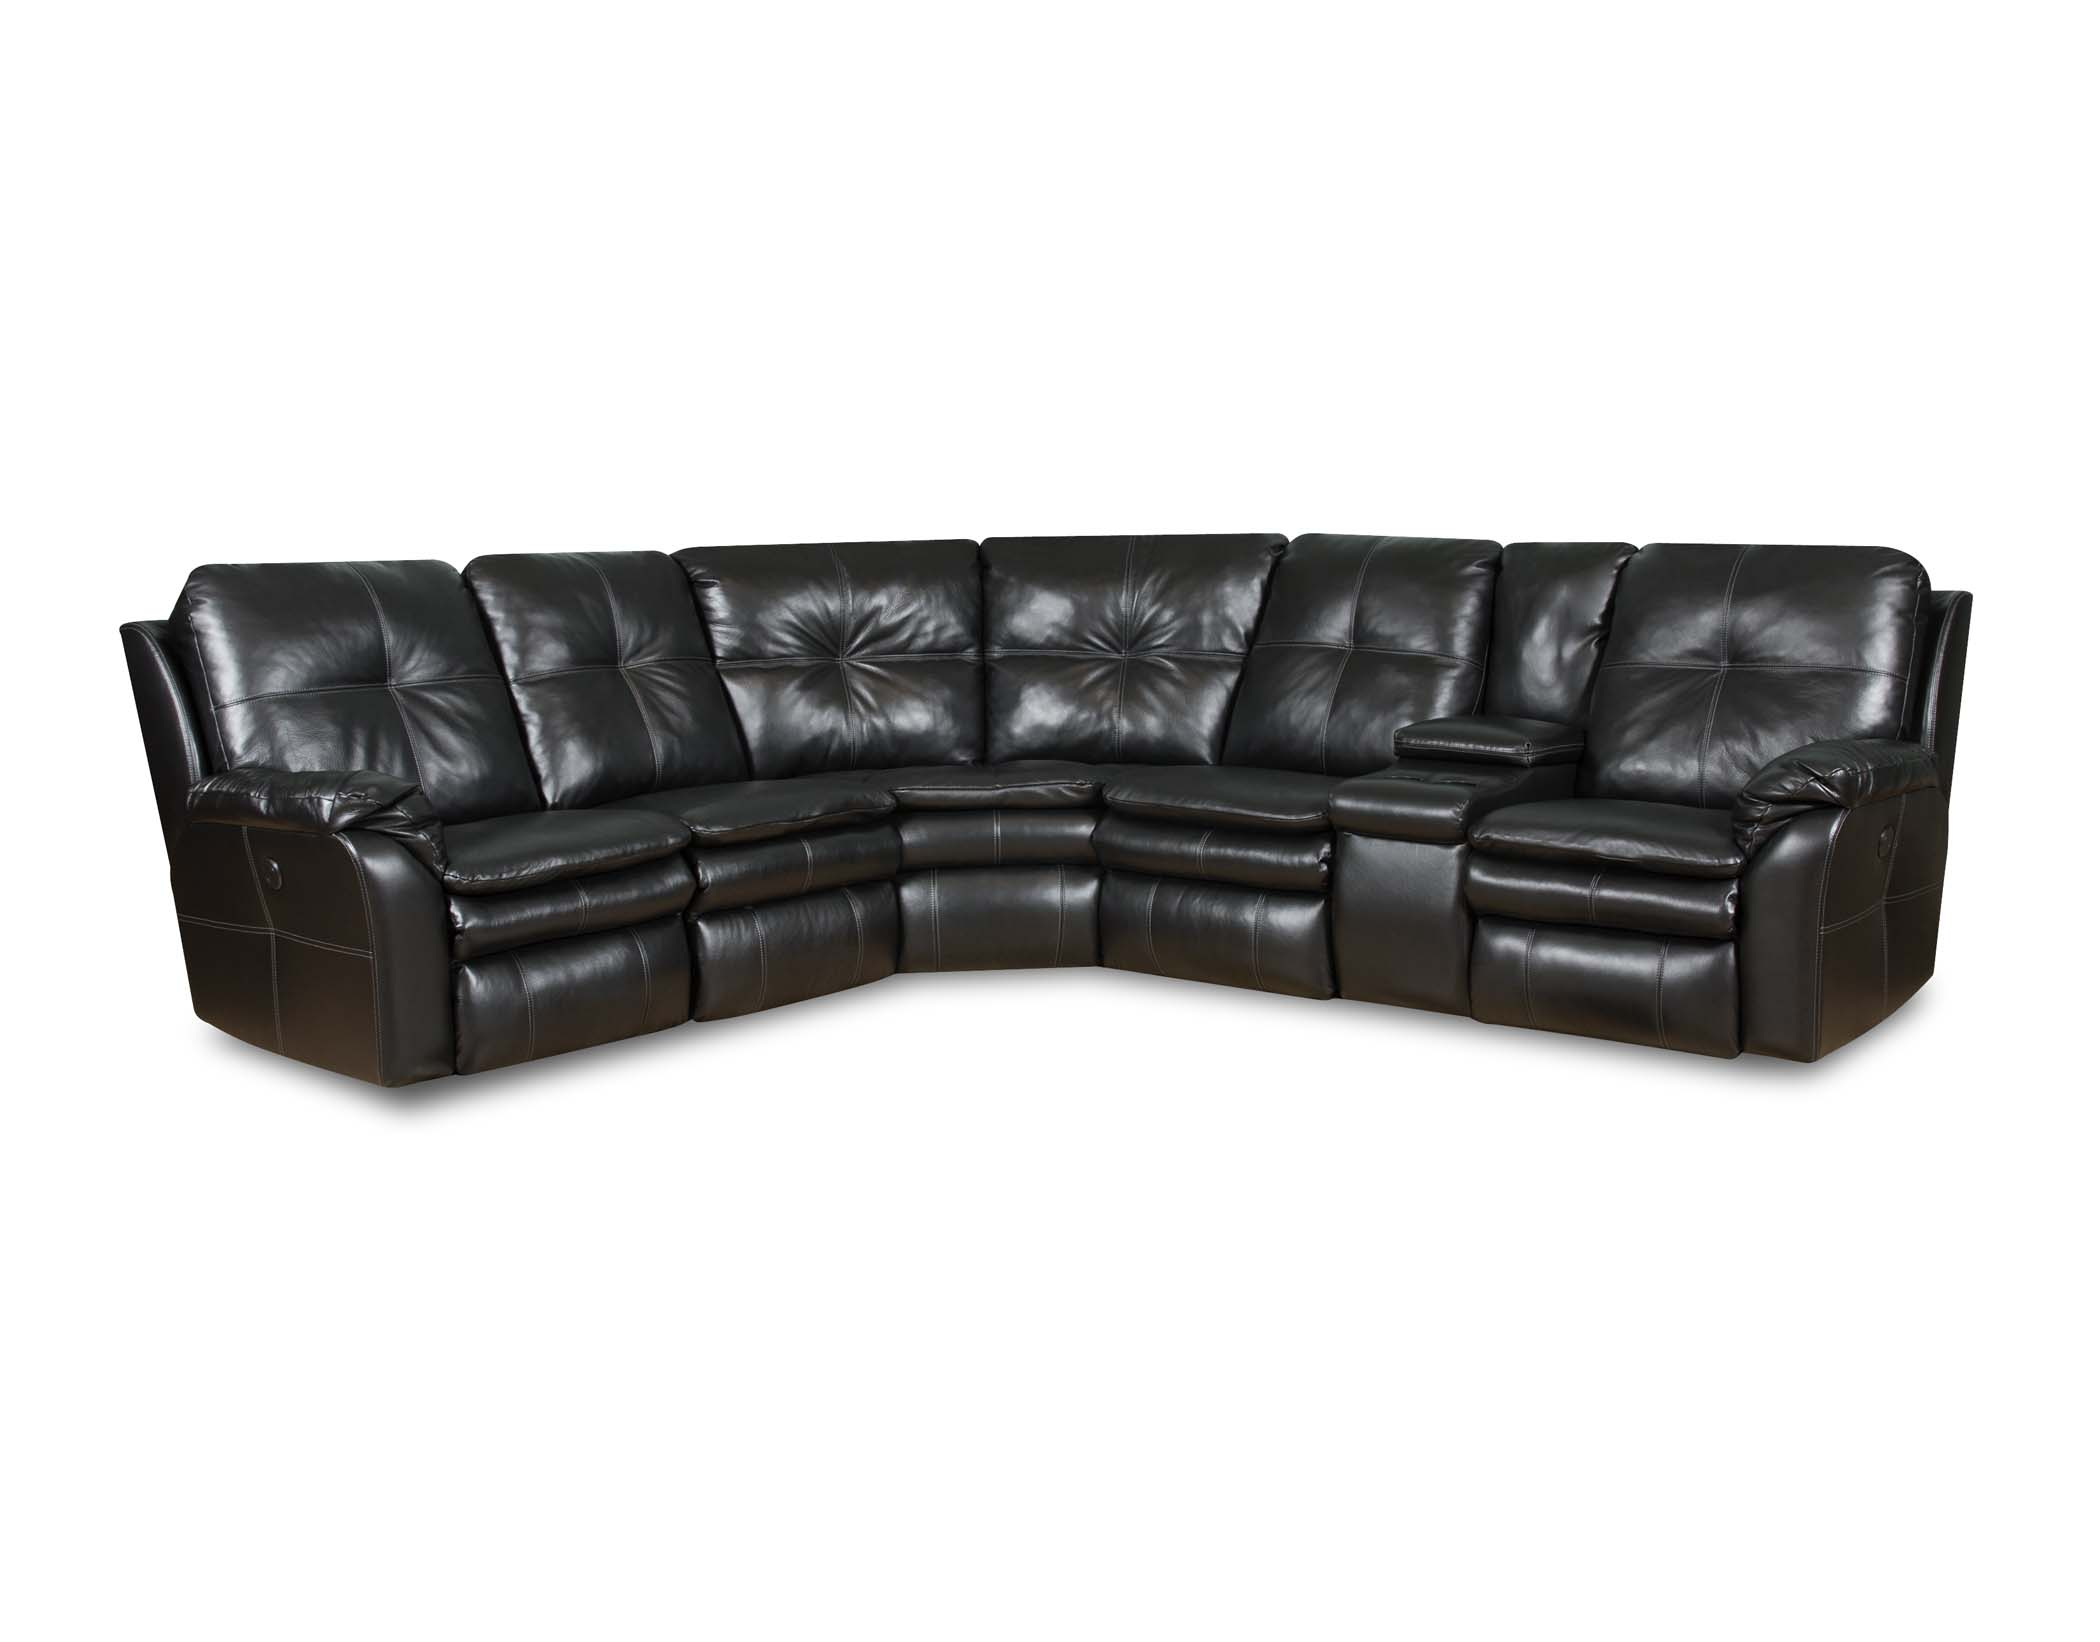 Axis Sectional Sofa hmmi